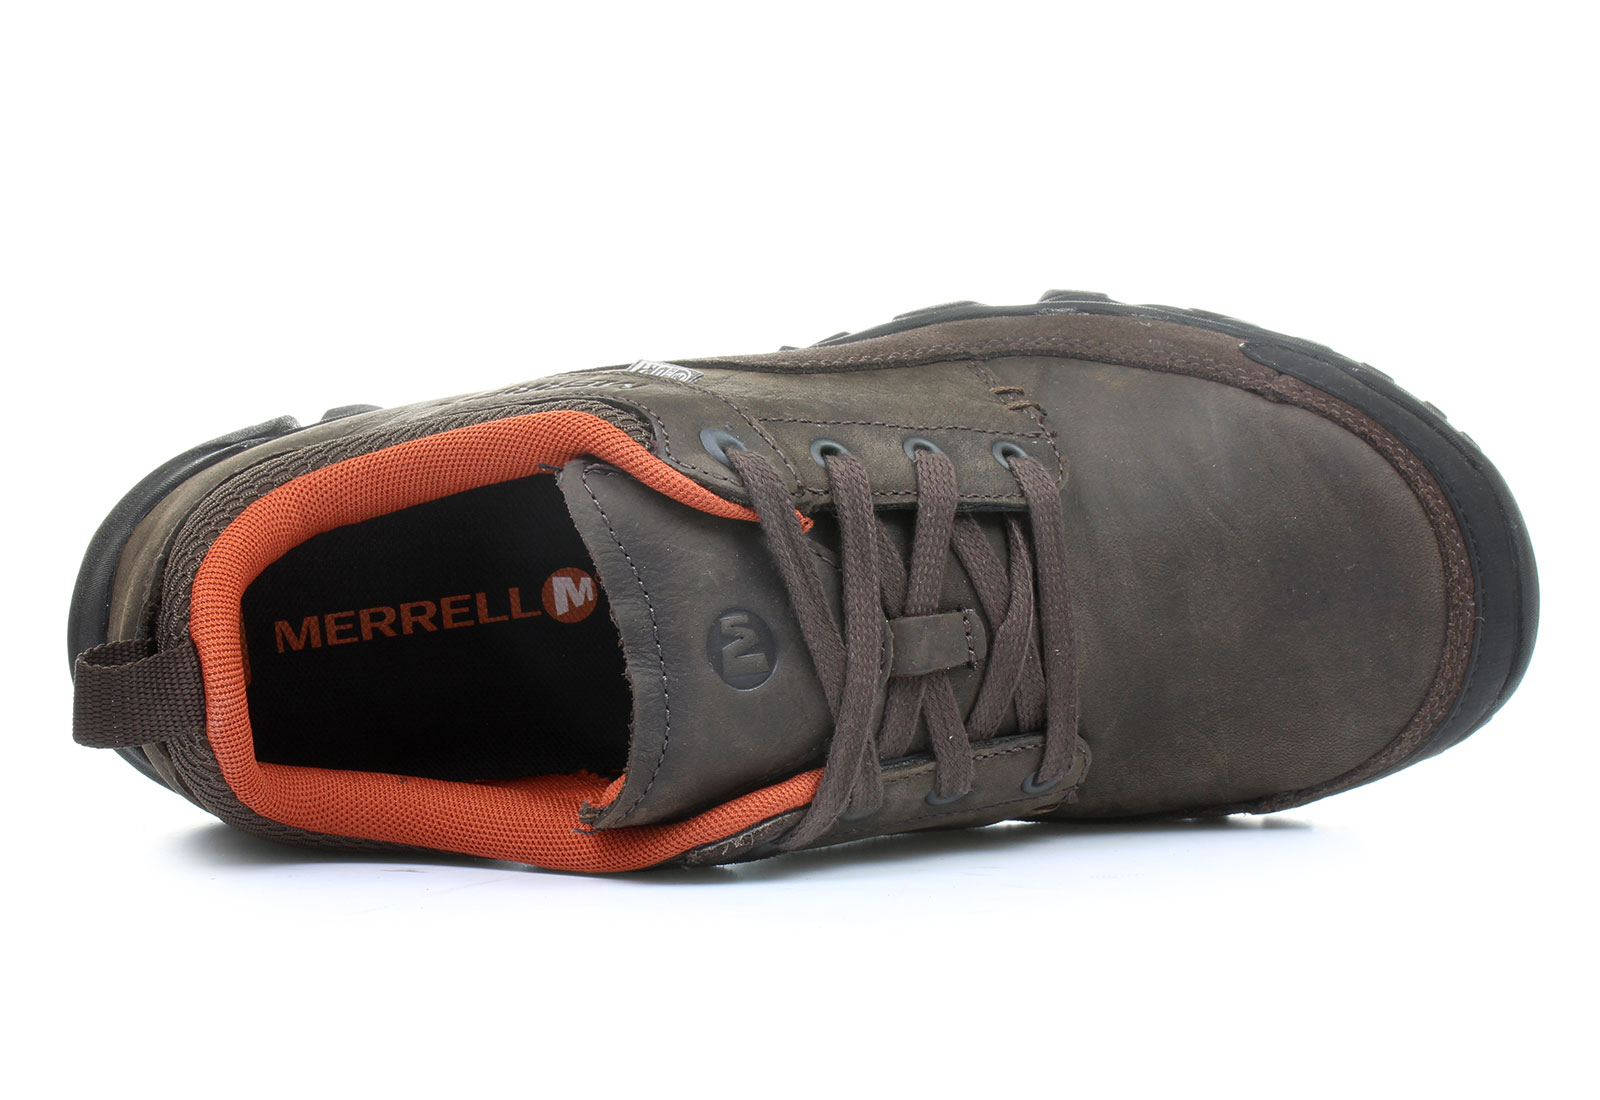 Merrell Cipő Telluride Wtpf J23535 brn Office Shoes